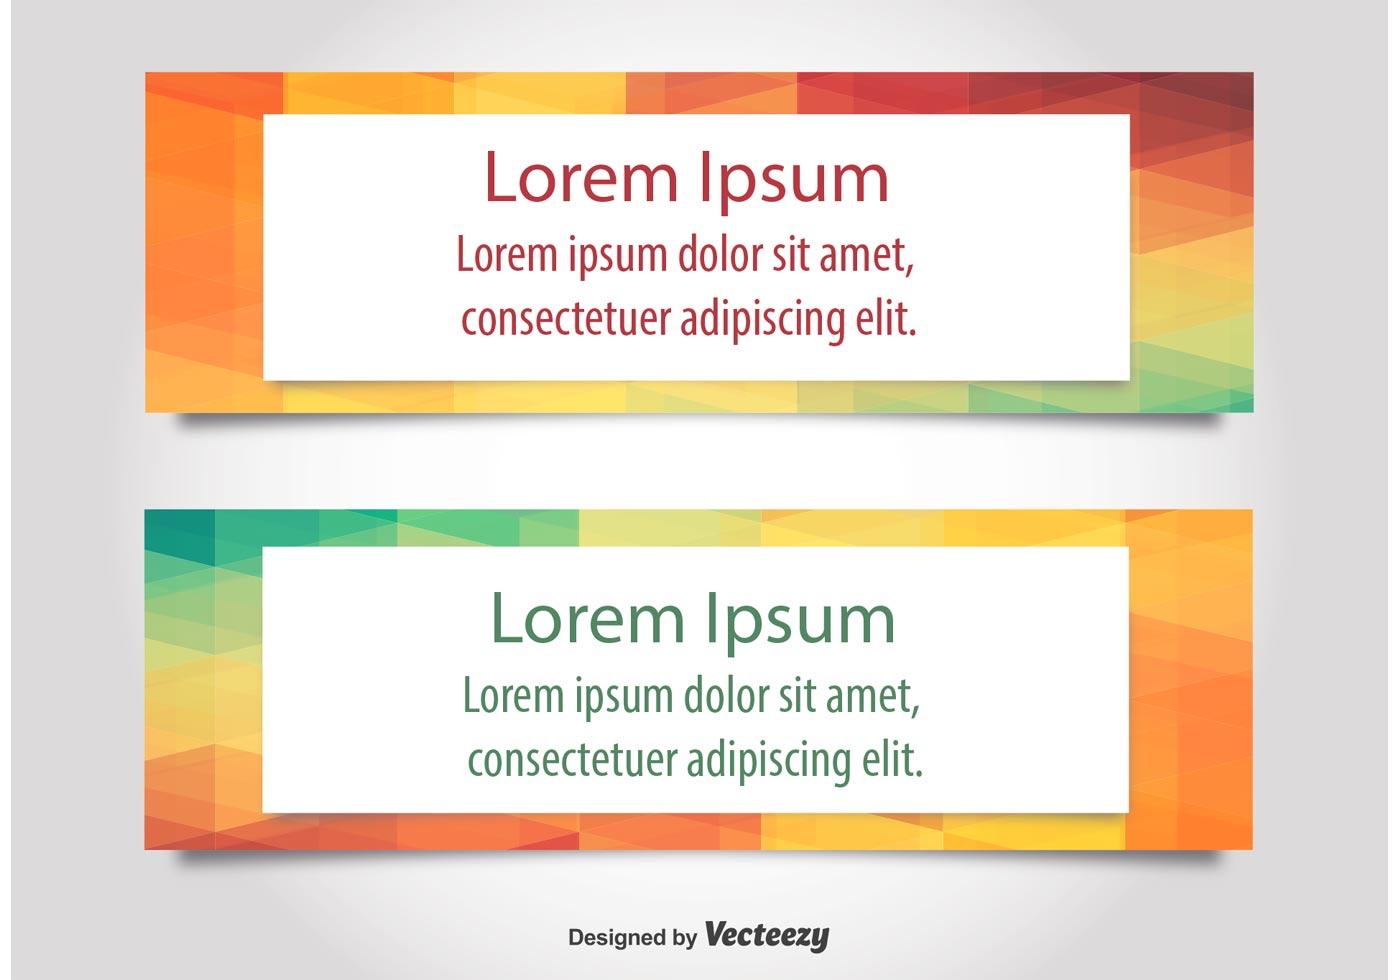 Modern text web banner vectors download free vector art - Text banner design ...